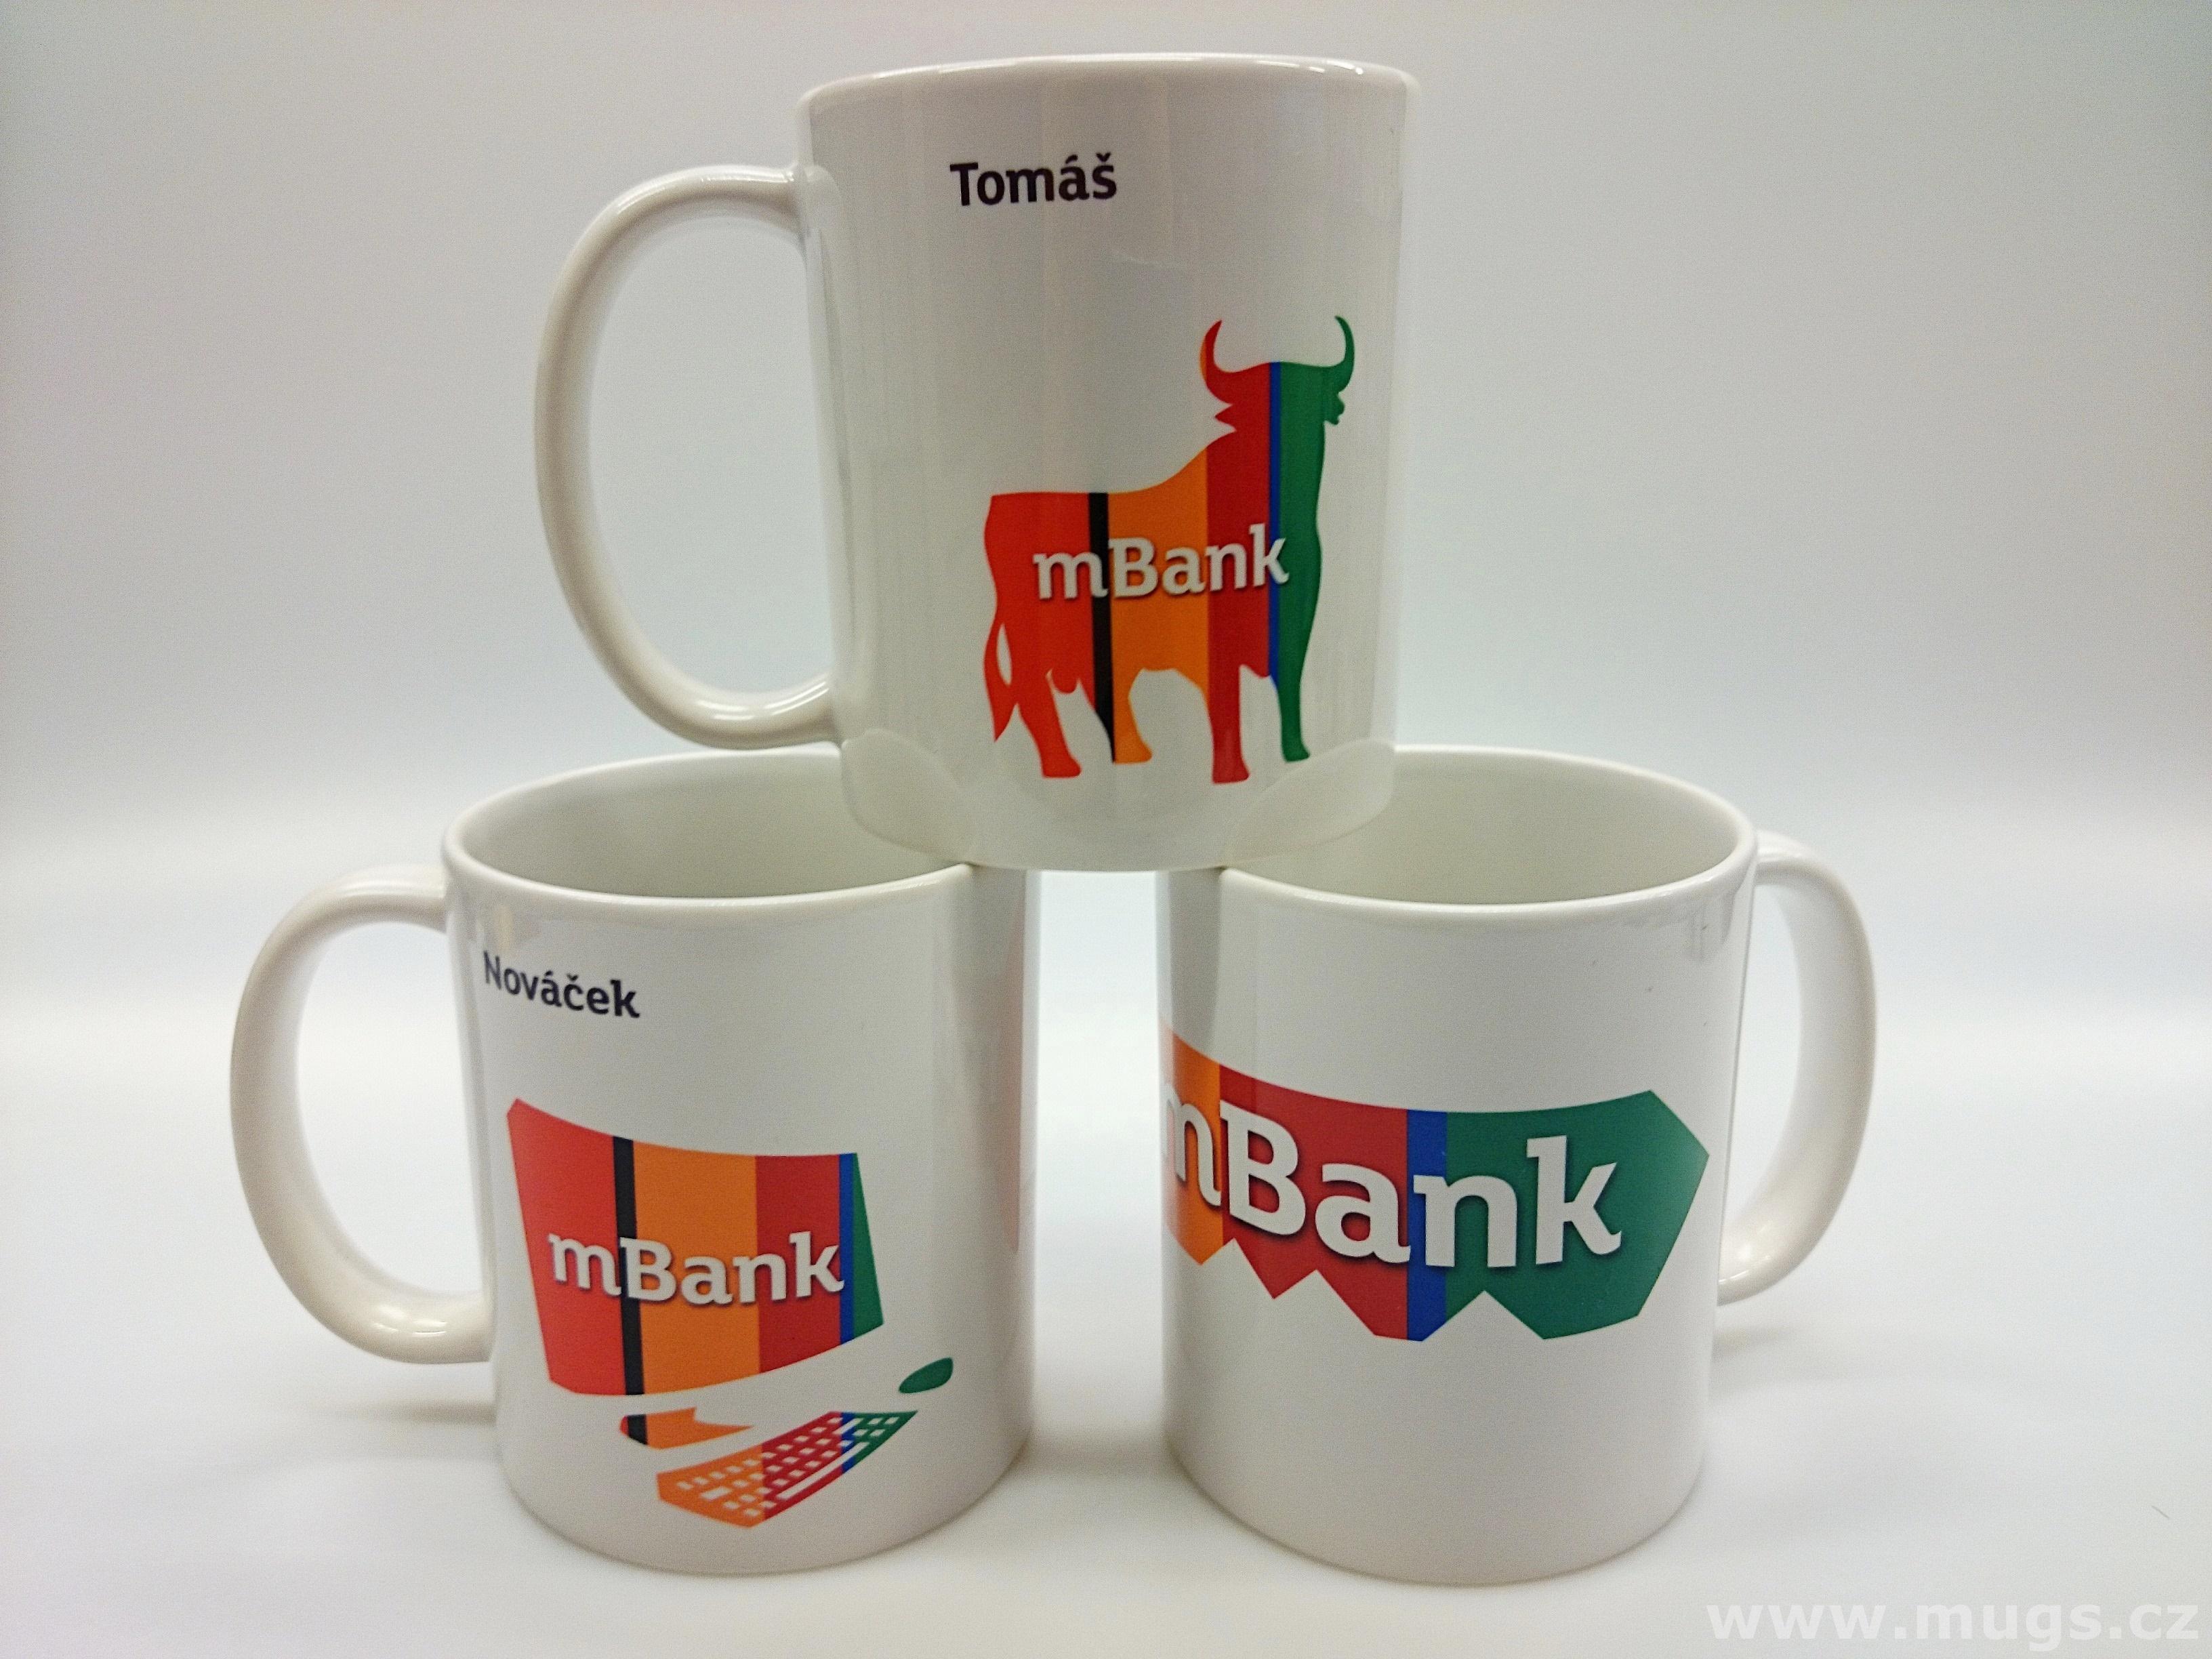 Sublimation Mugs, Photo Mugs, Mug Press Machines - BC MUGS